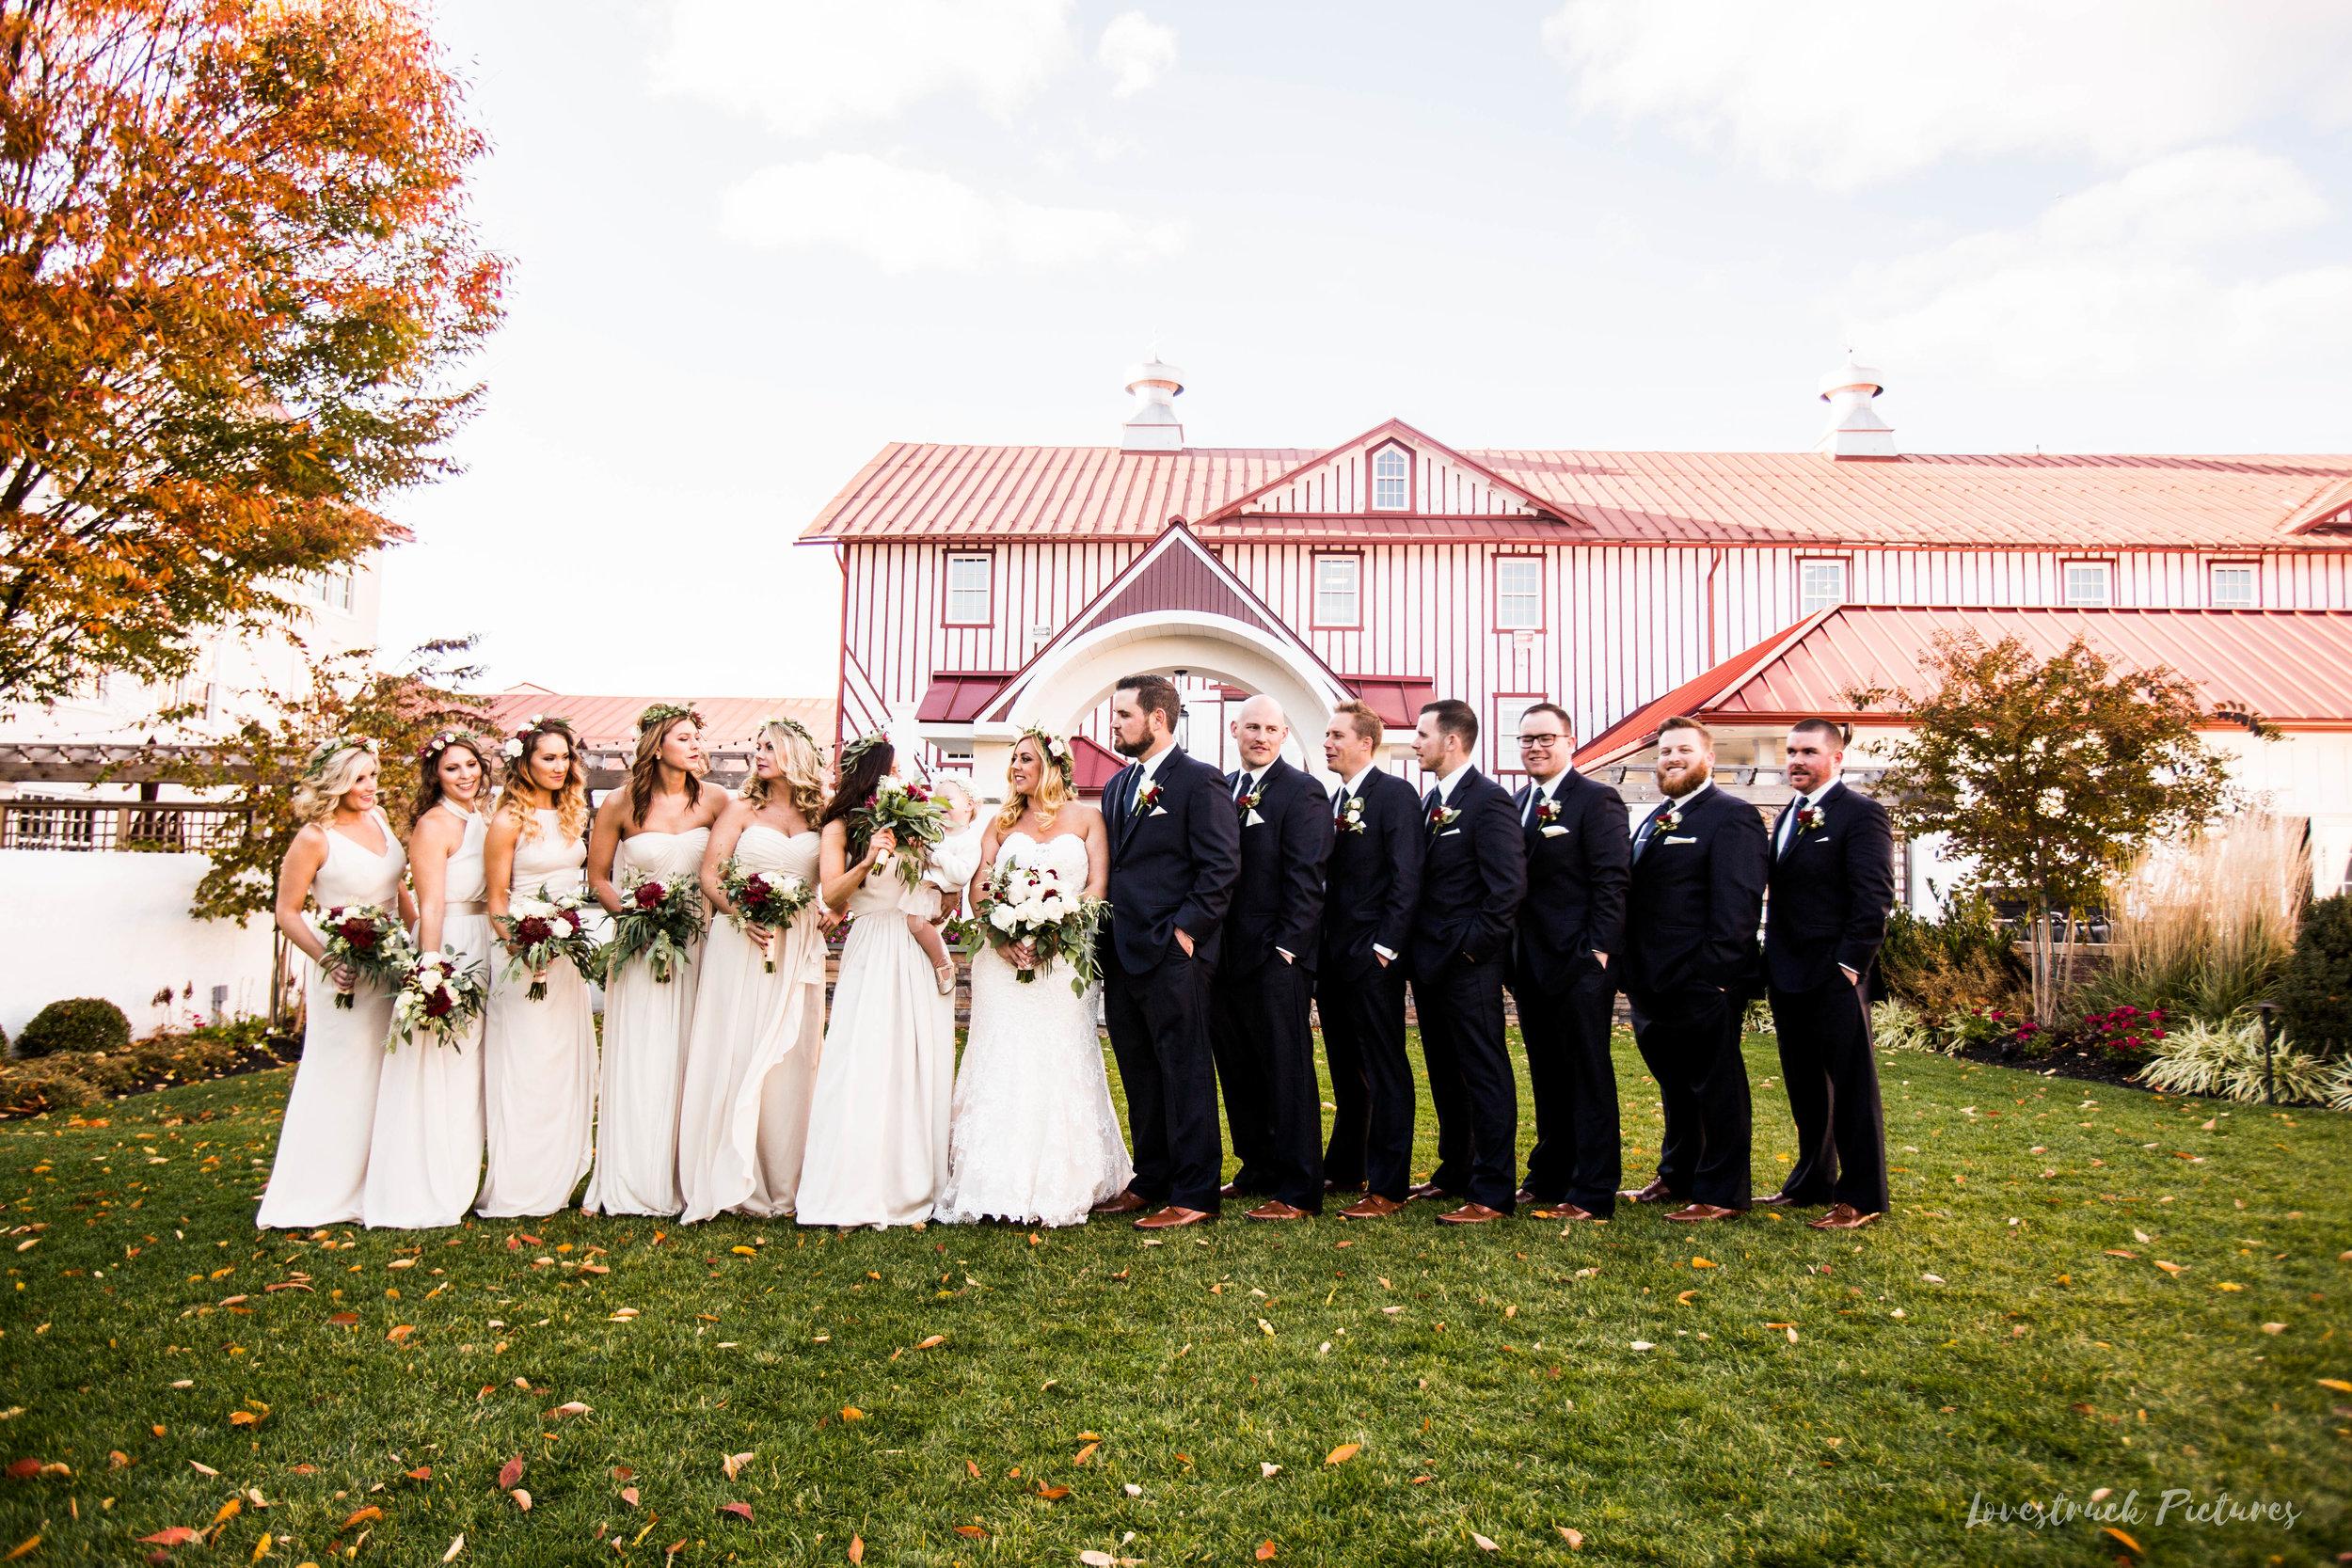 NORMANDY_FARMS_WEDDING_BLUEBELL_PA--32.jpg